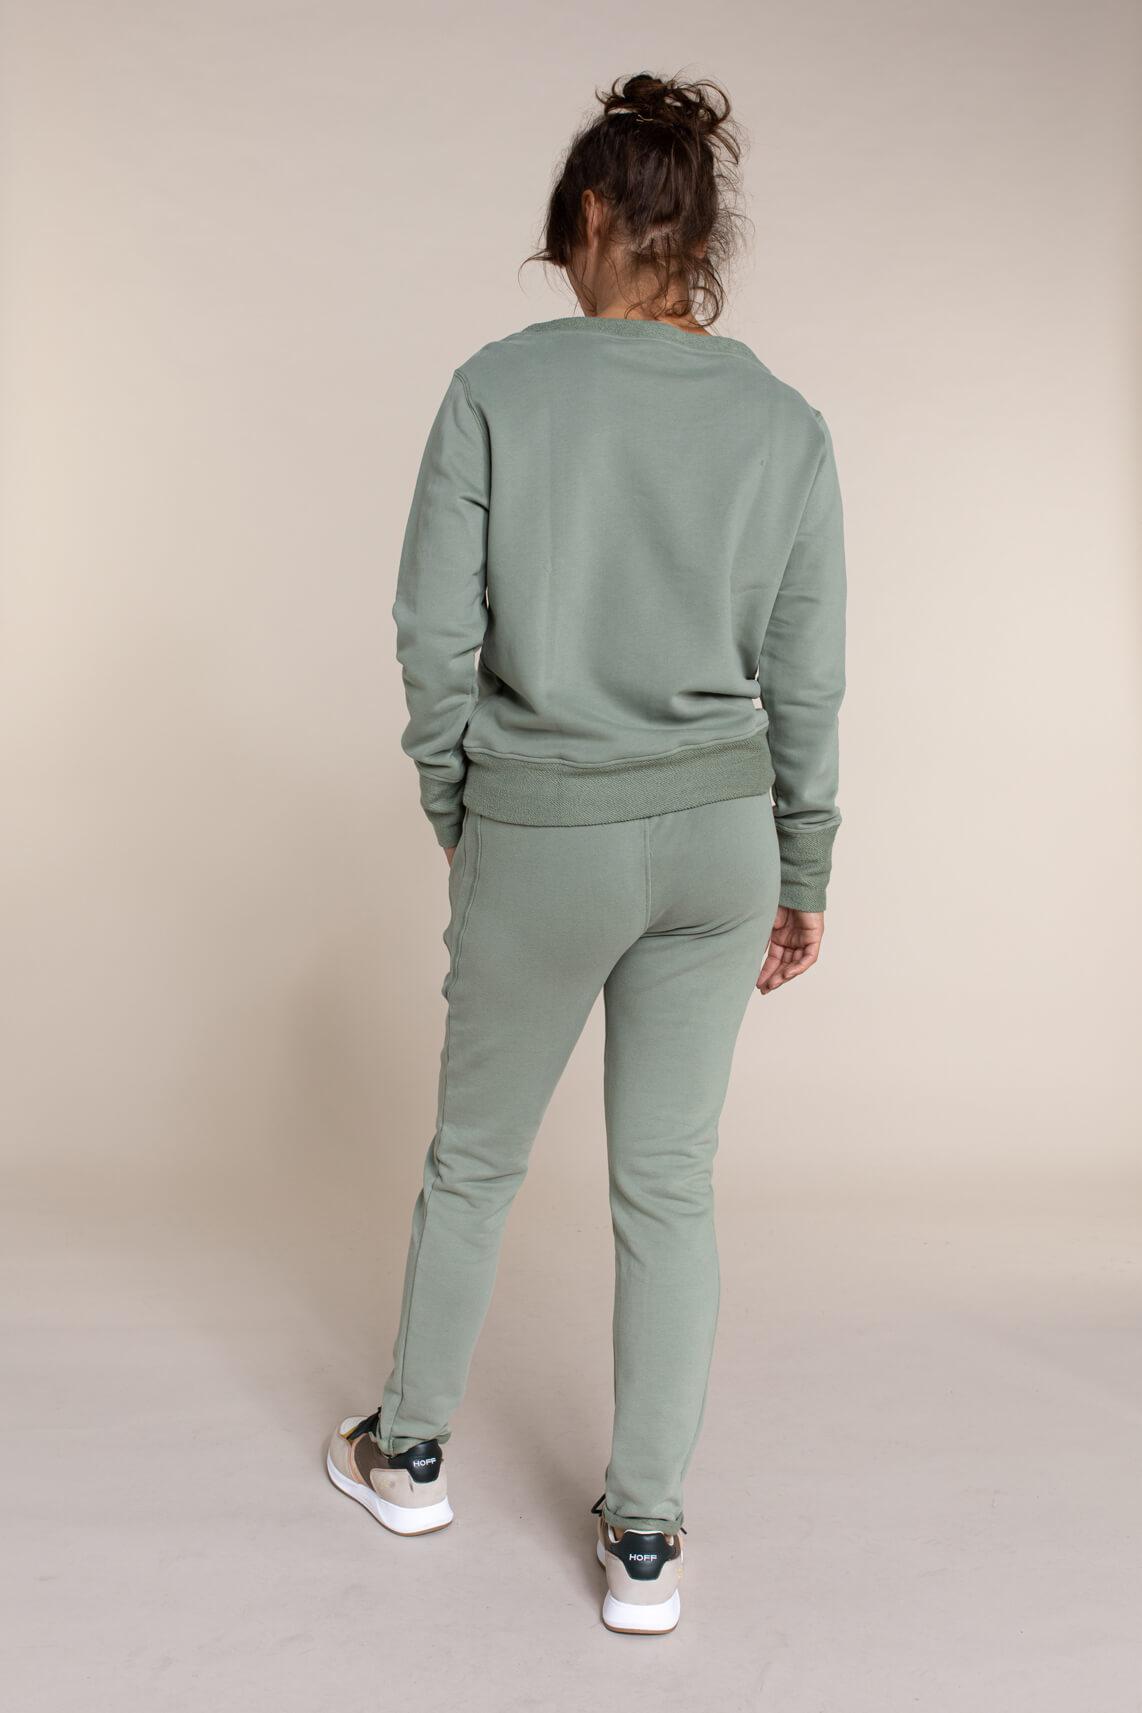 Moscow Dames Tyana sweater groen